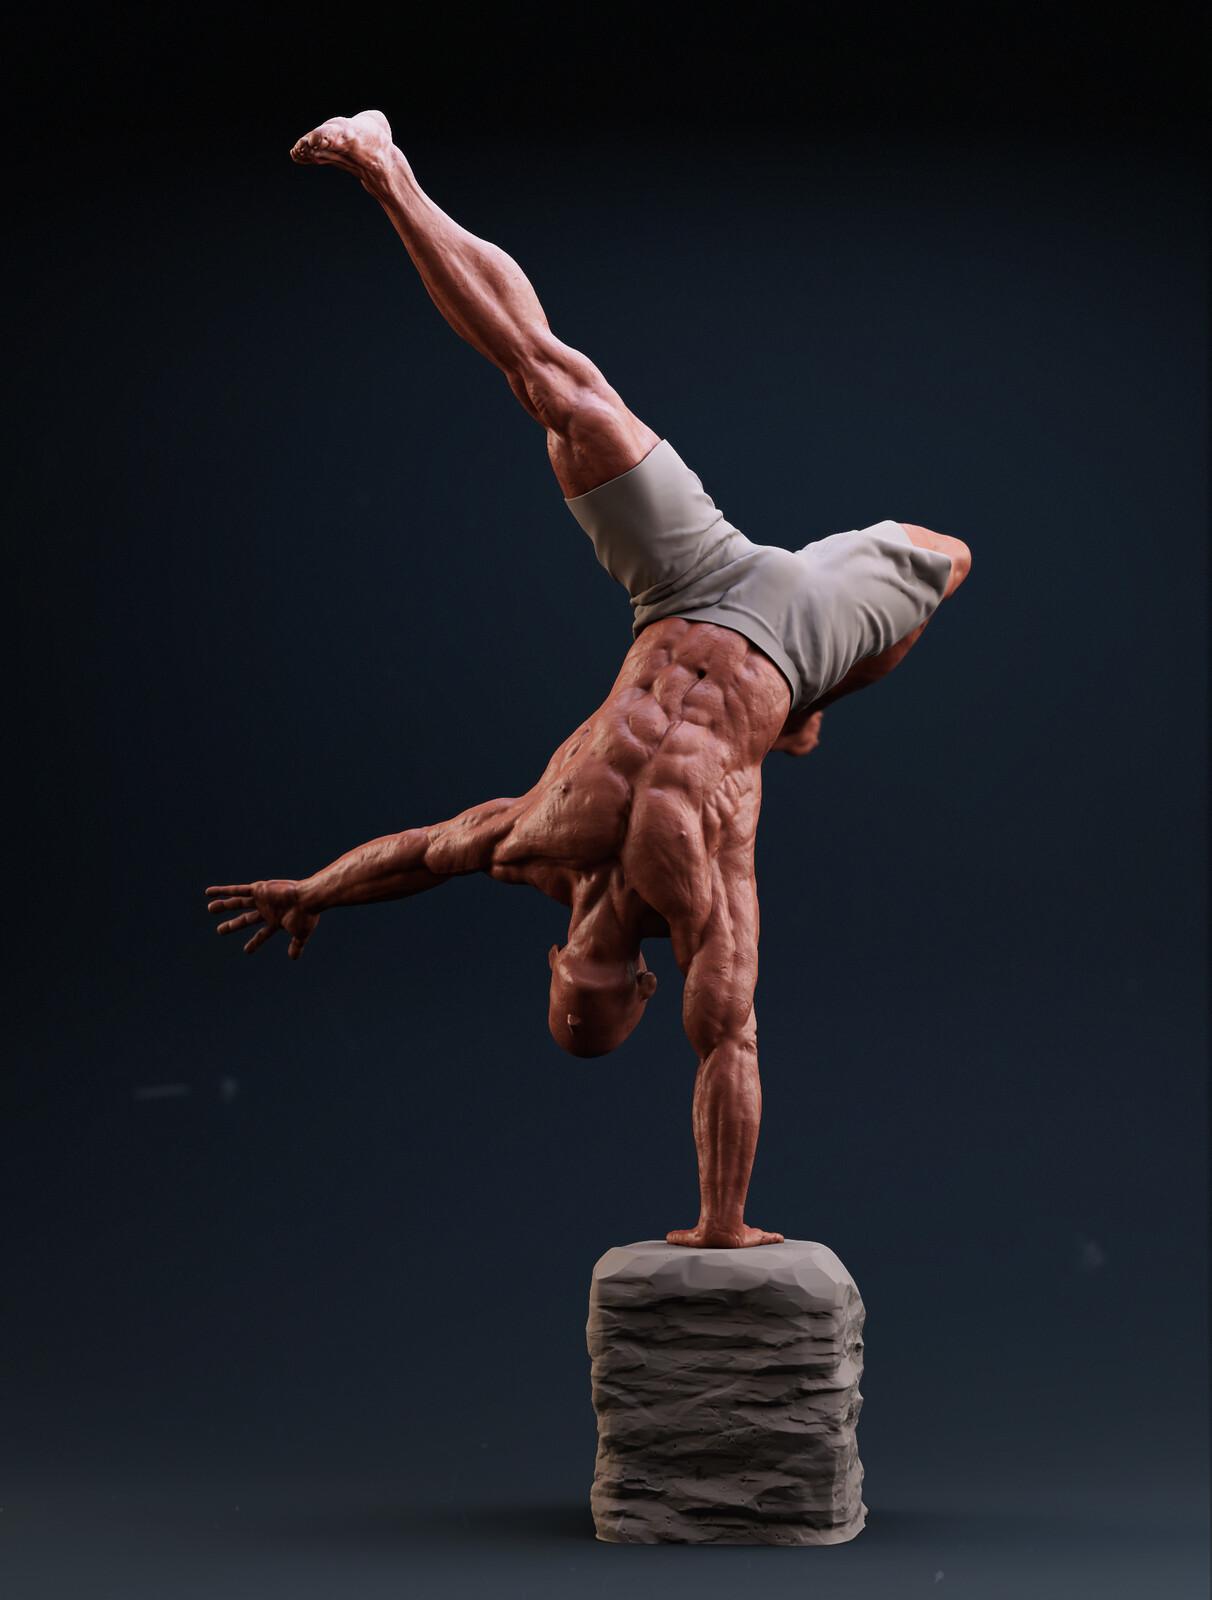 Handstand anatomy study